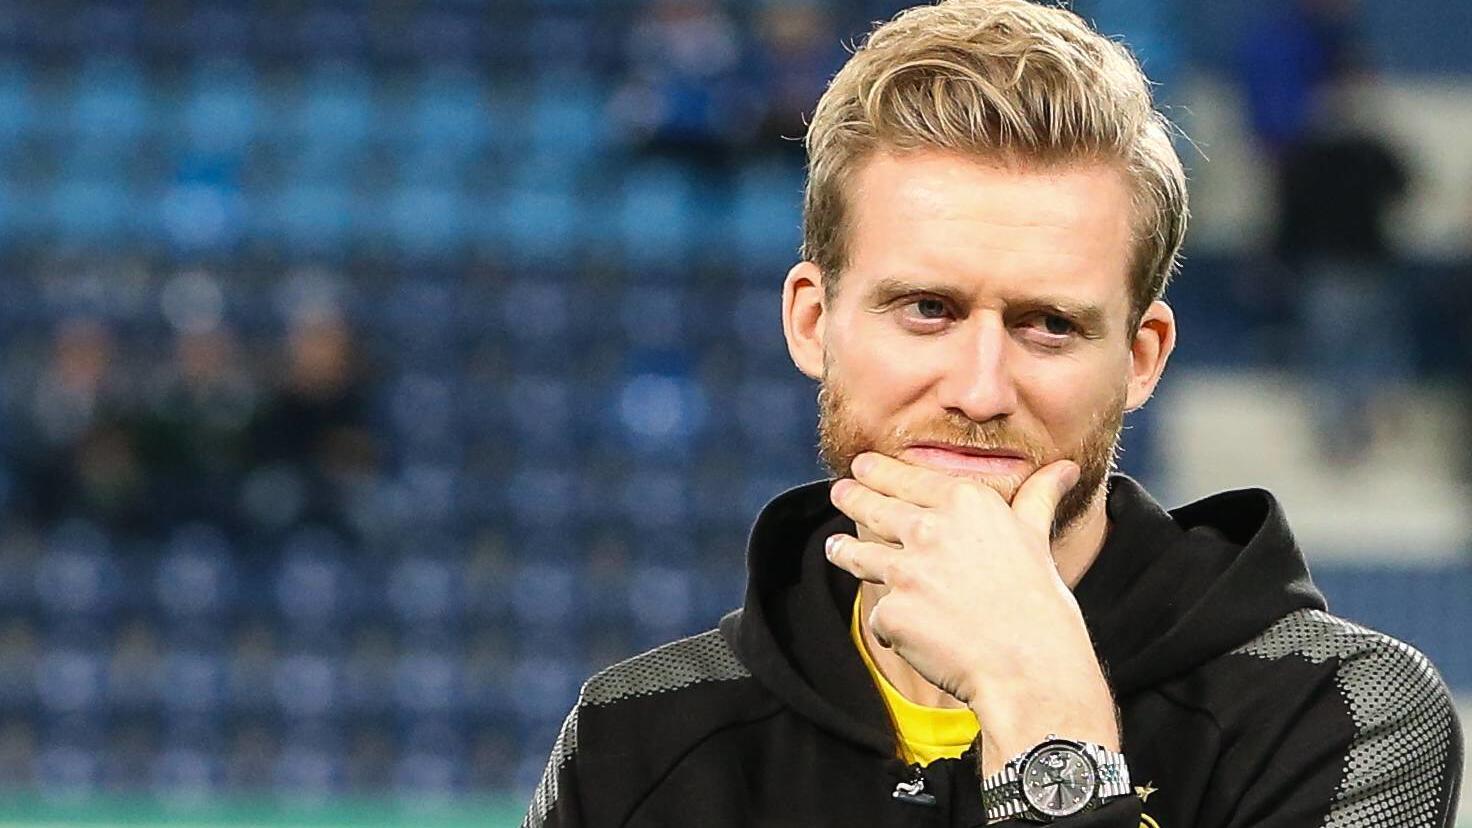 Andre Schürrle (Borussia Dortmund) - 2. Hauptrunde DFB Pokal Saison 2017-2018 1. FC Magdeburg vs. Borussia Dortmund in